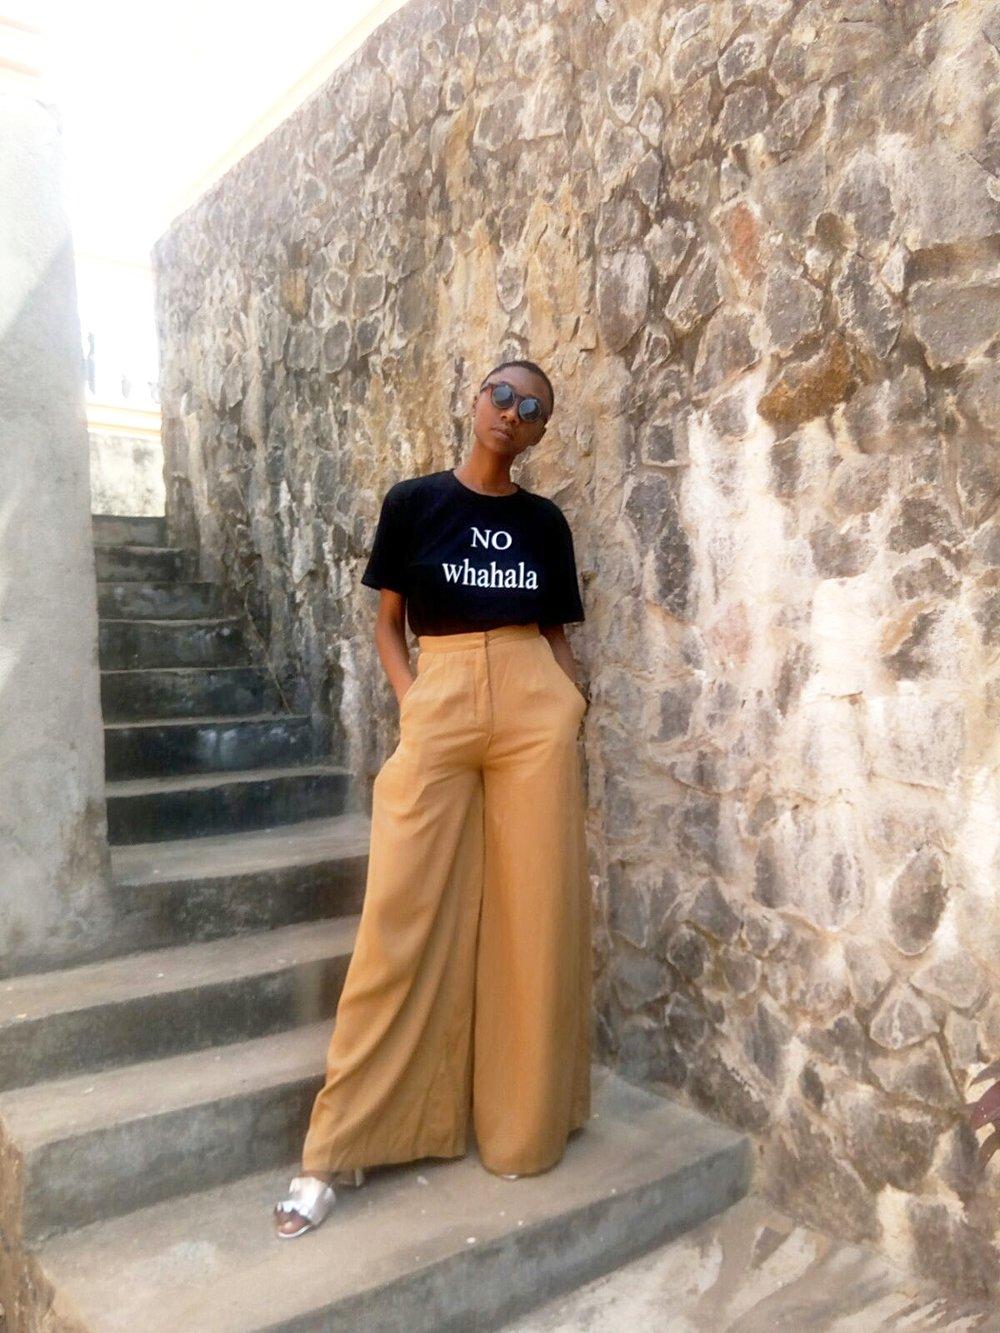 In sIERRA LEONE WE SAY.. - A West African phrase, soon turned global